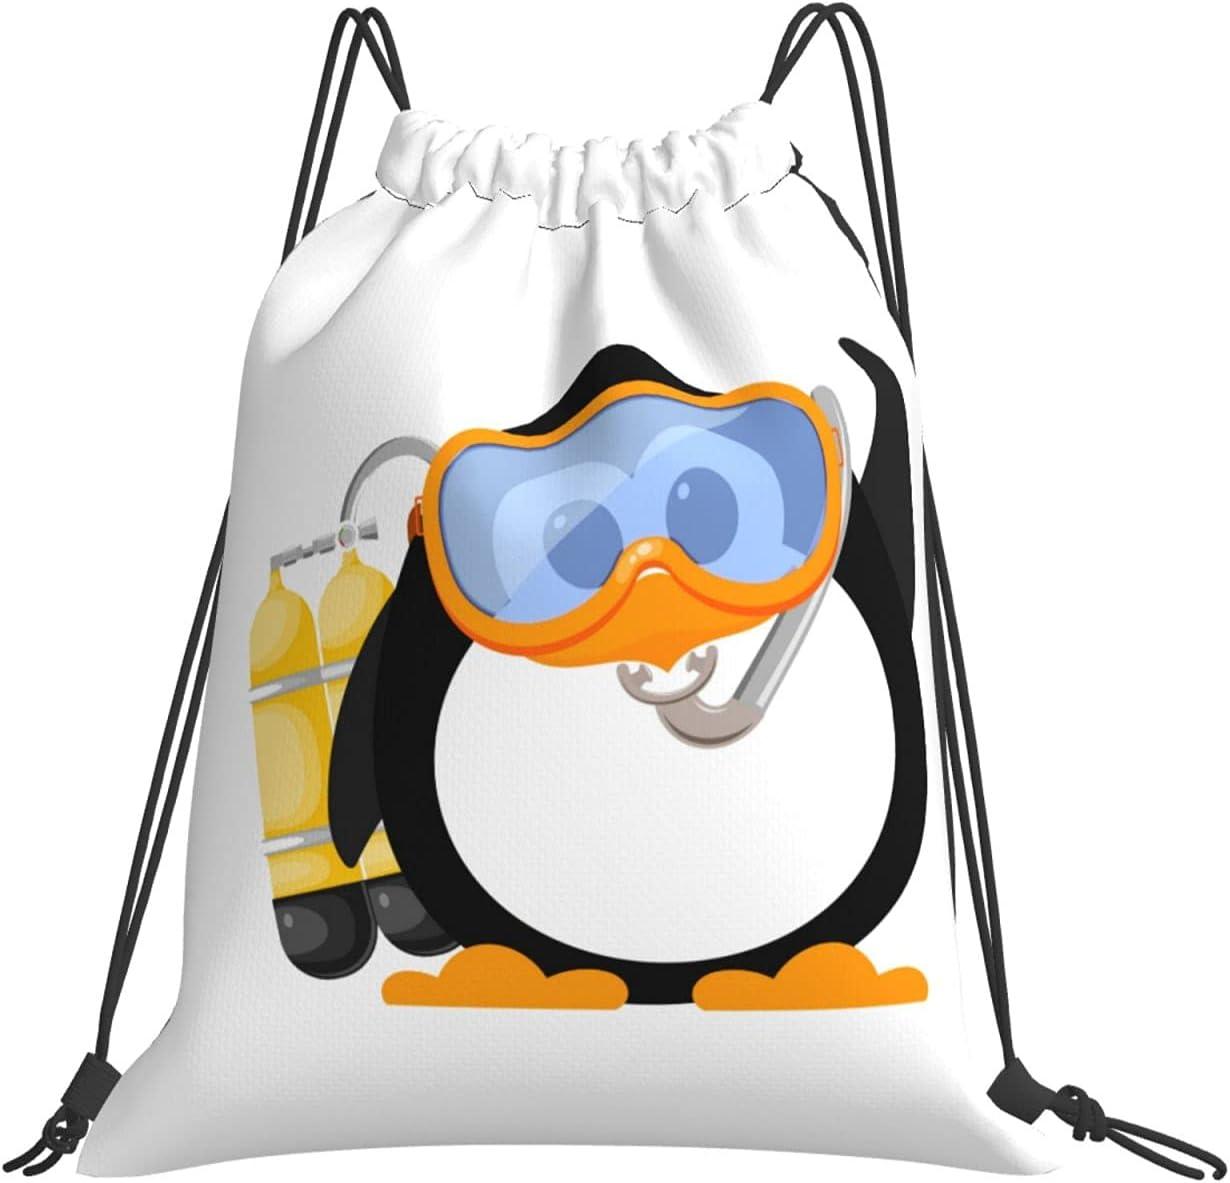 Diving Cartoon Penguin Drawstring Backpack Sports New York Mall Gym Bag Manufacturer direct delivery H Yoga